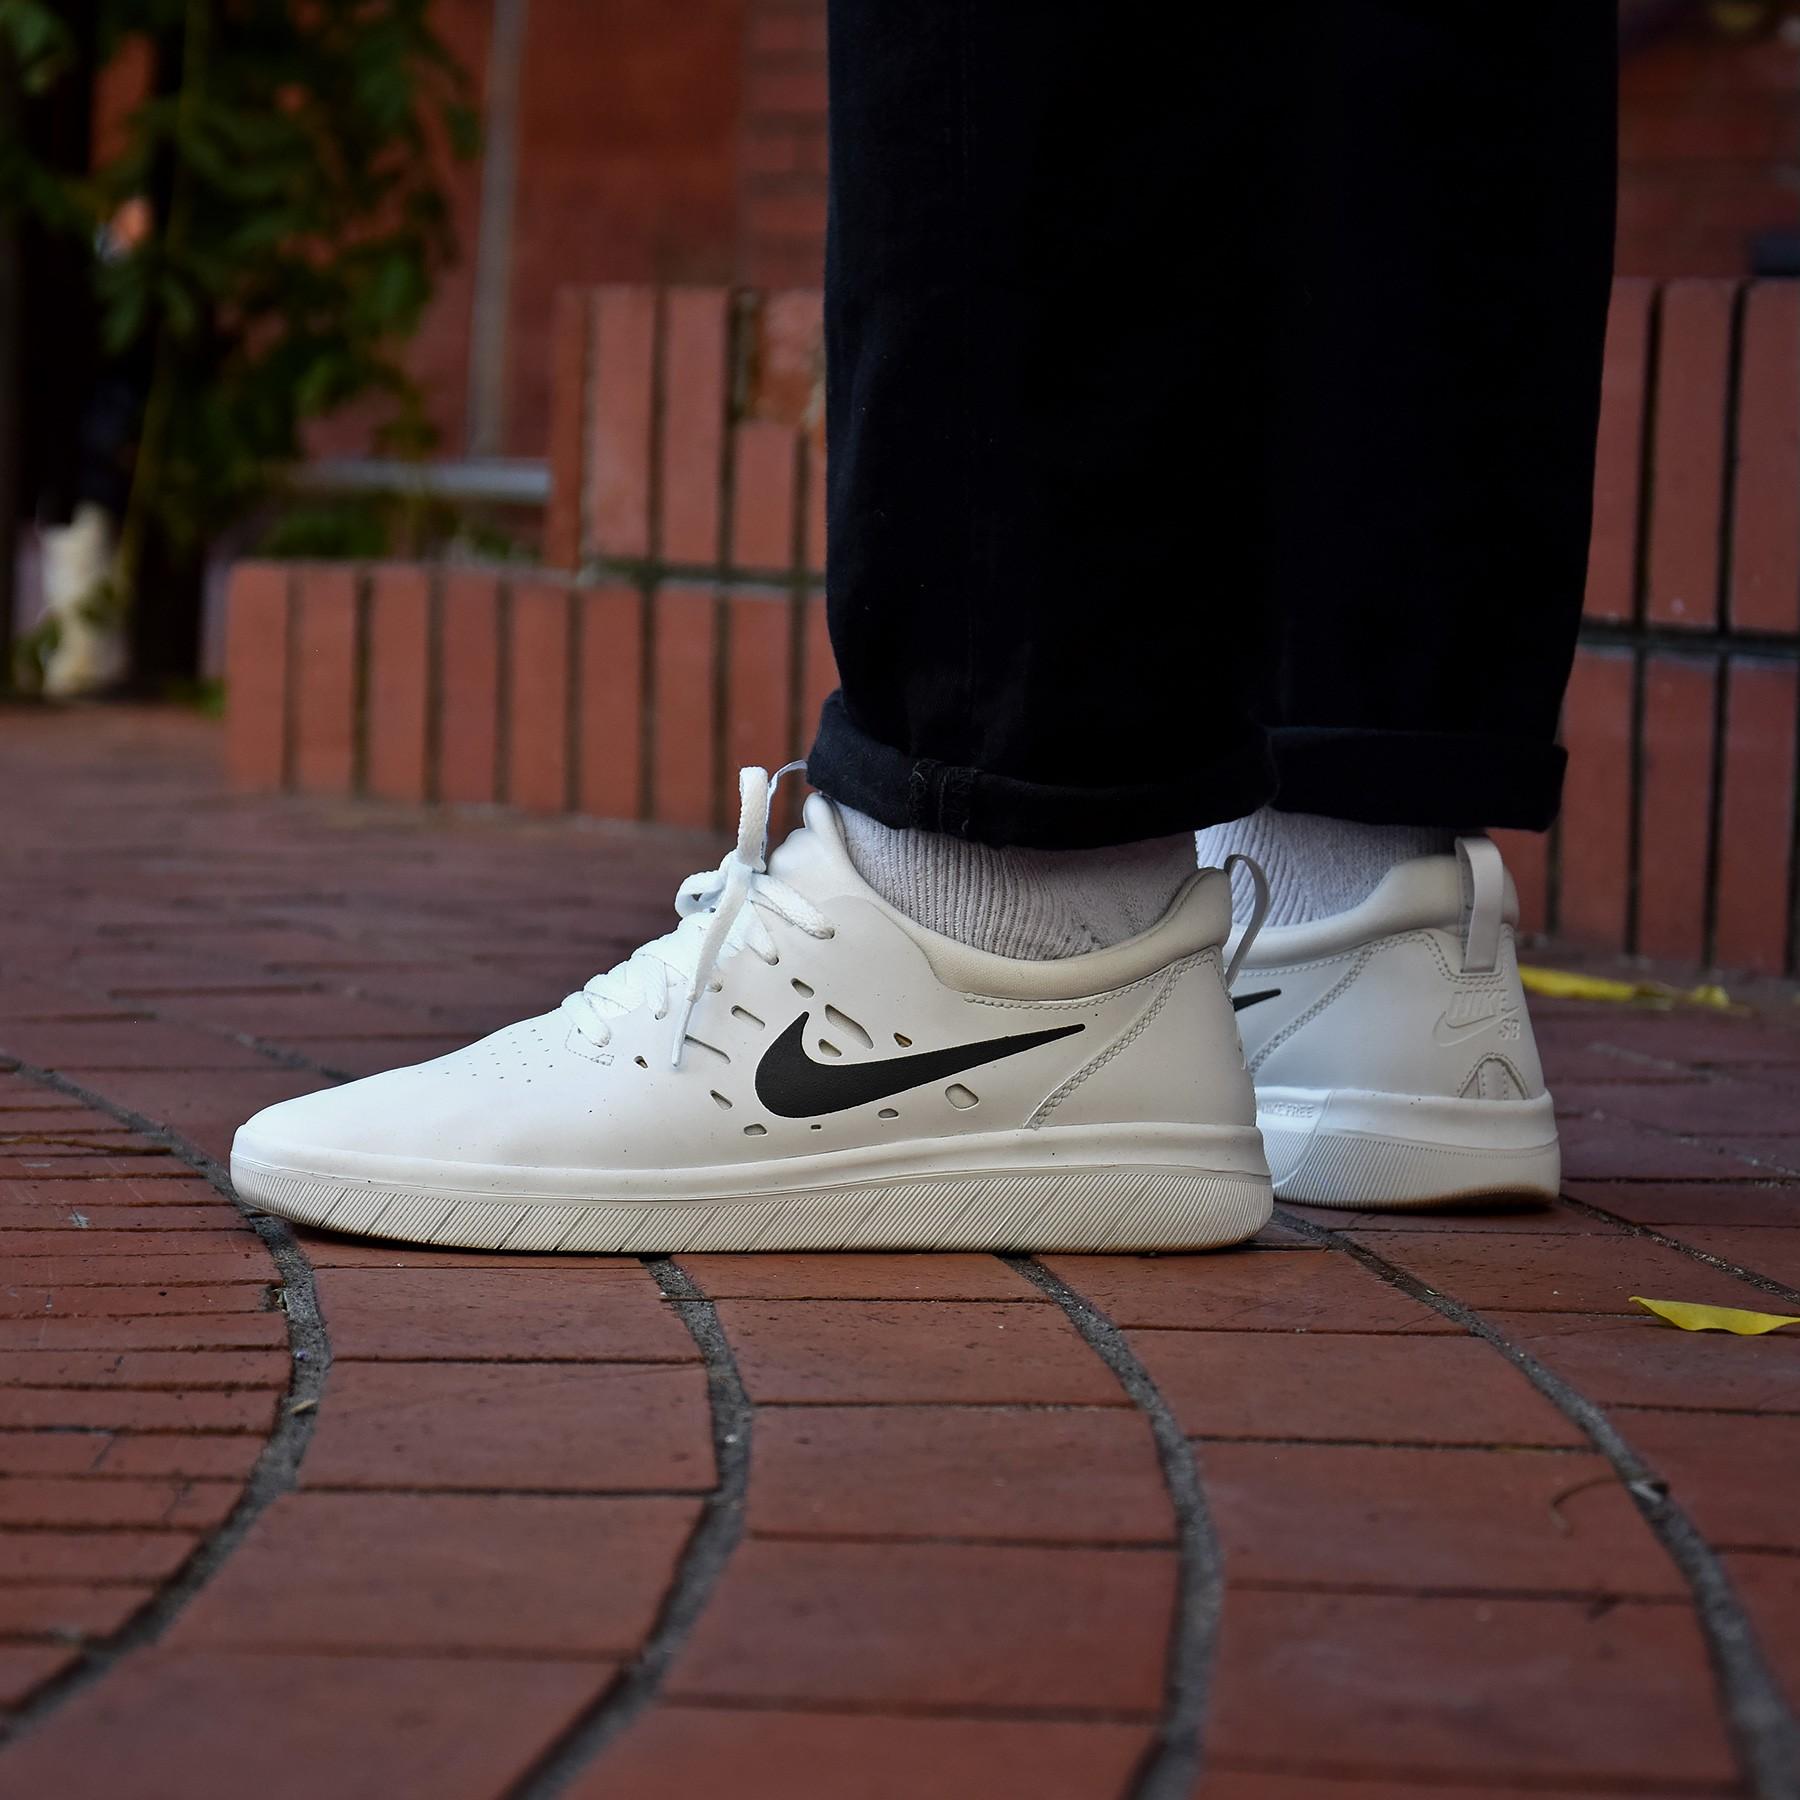 286afdd8f0a0dc Nike SB Nyjah Free - Sneakers   Street Culture depuis 2005